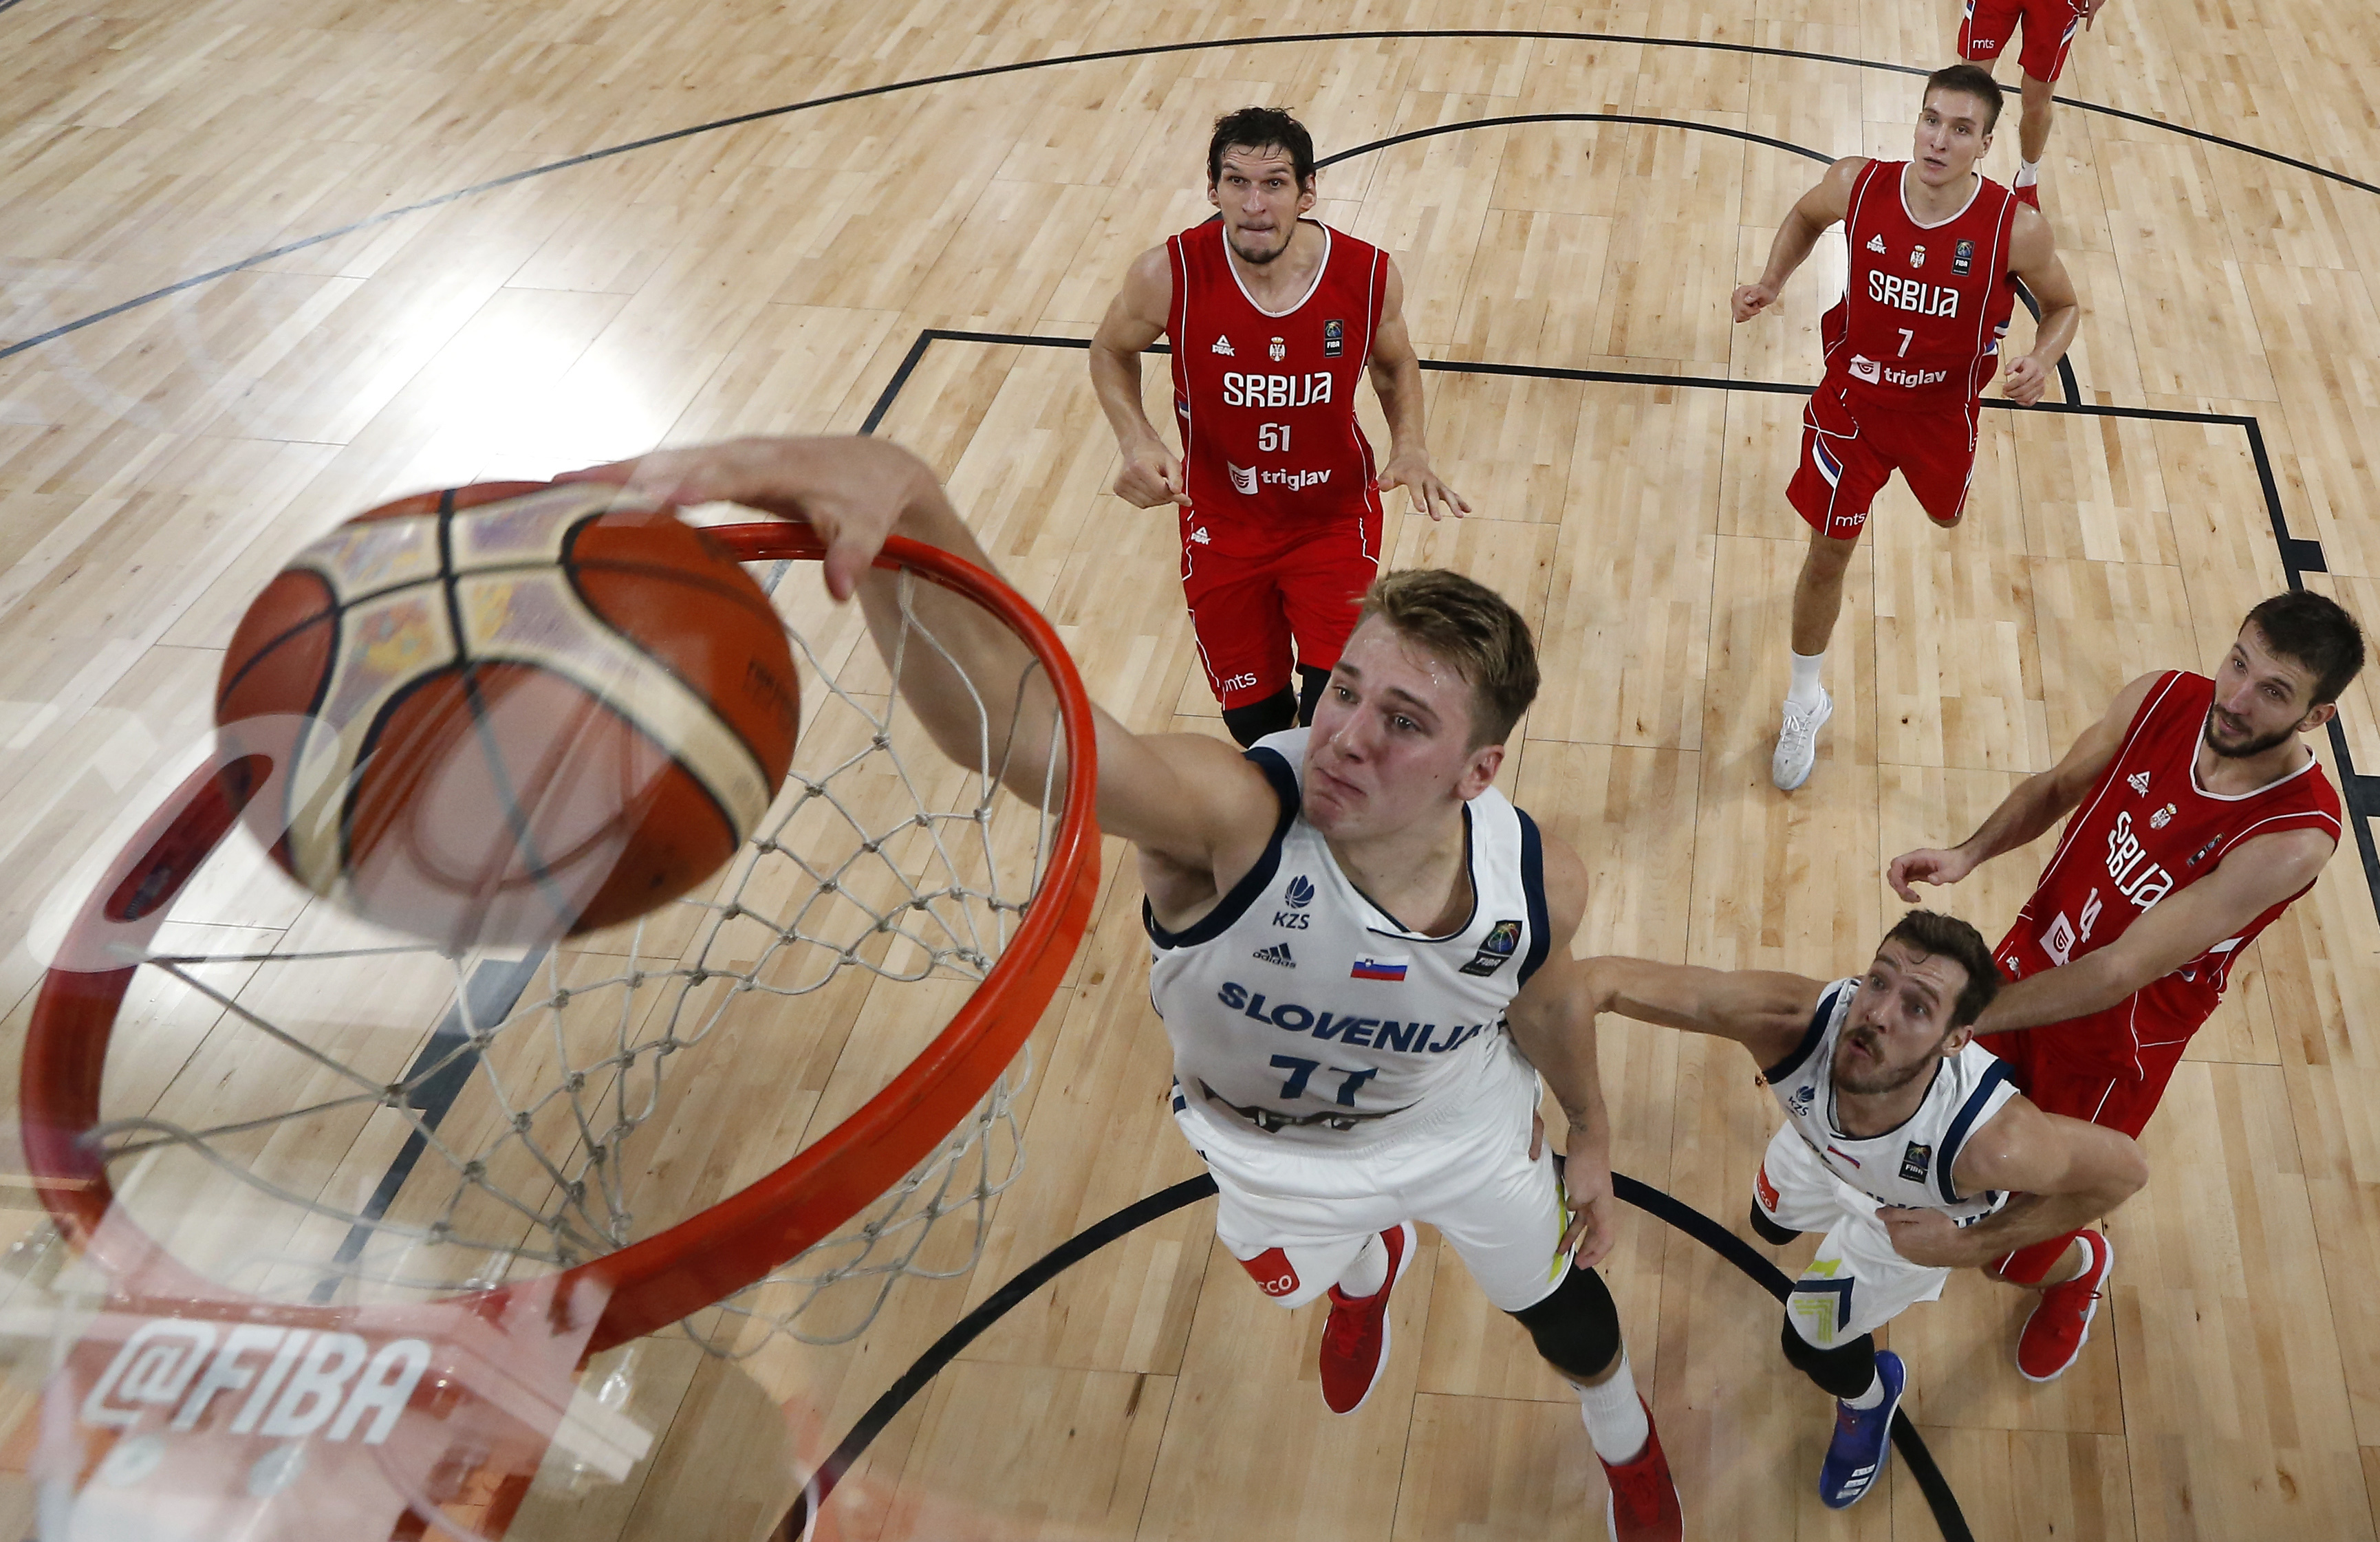 f0e36b418 NBA Draft 2018 rumor mill  Hawks like Luka Doncic at No. 3